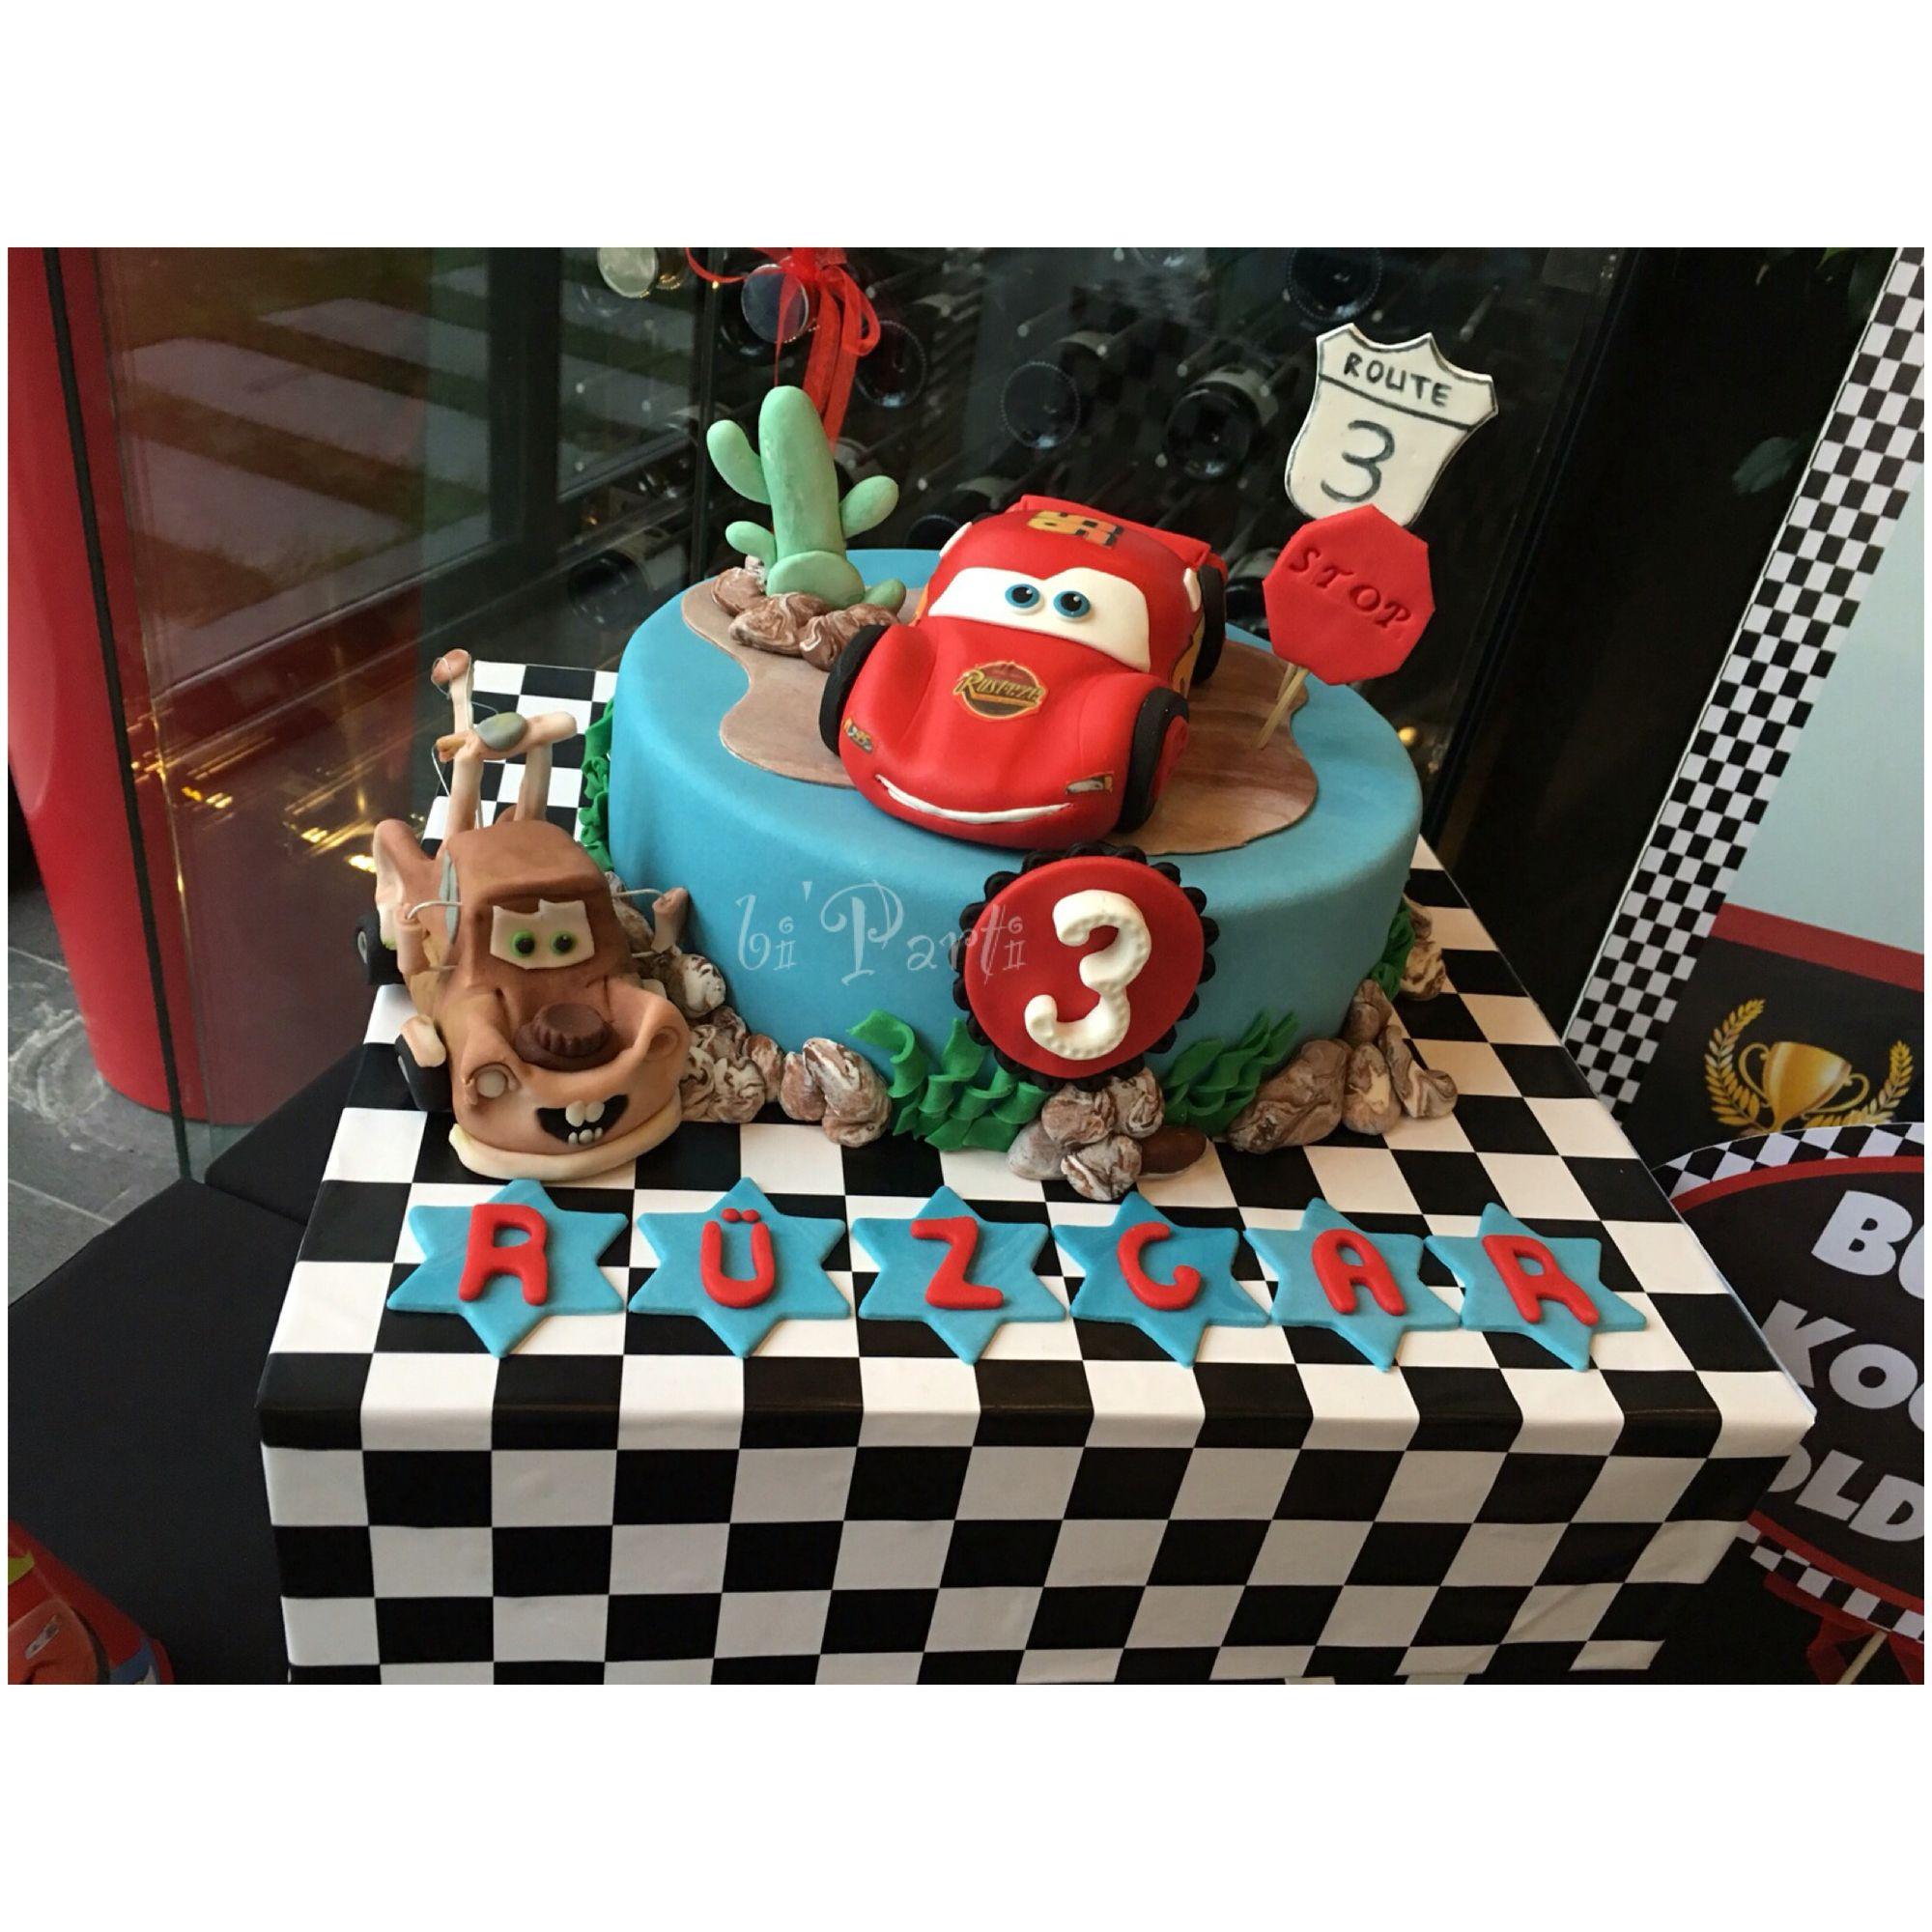 Cars Cake Mcqueen Cake Cars Party Ideas Simsek Mcqueen Pasta